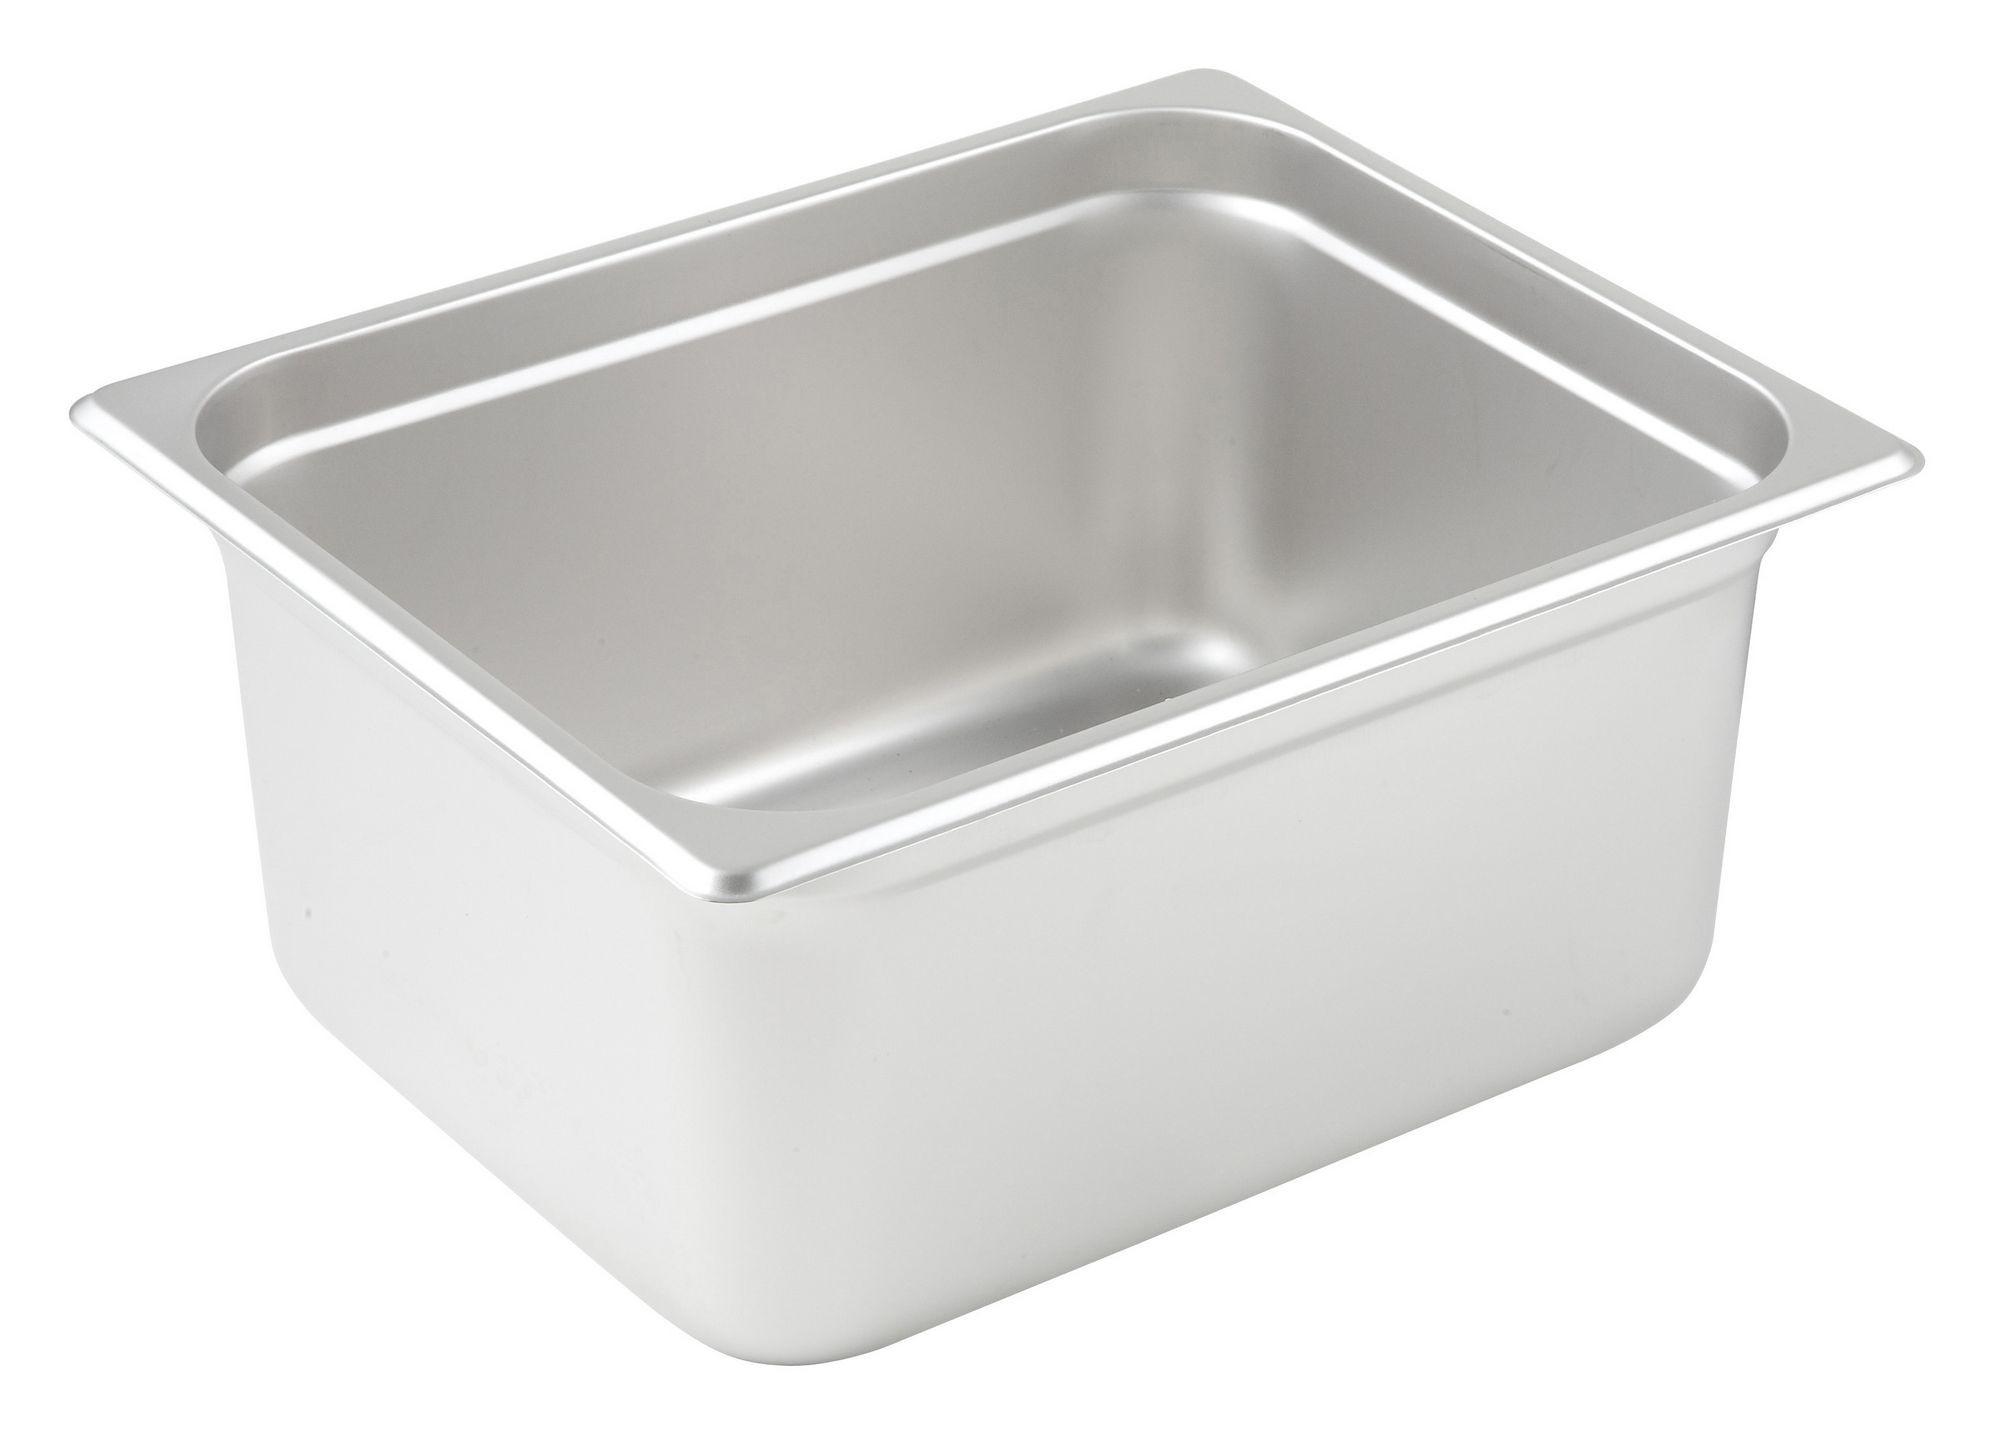 Winco Half Size Anti-Jamming Steam Table Pan (23 Gauge, 6